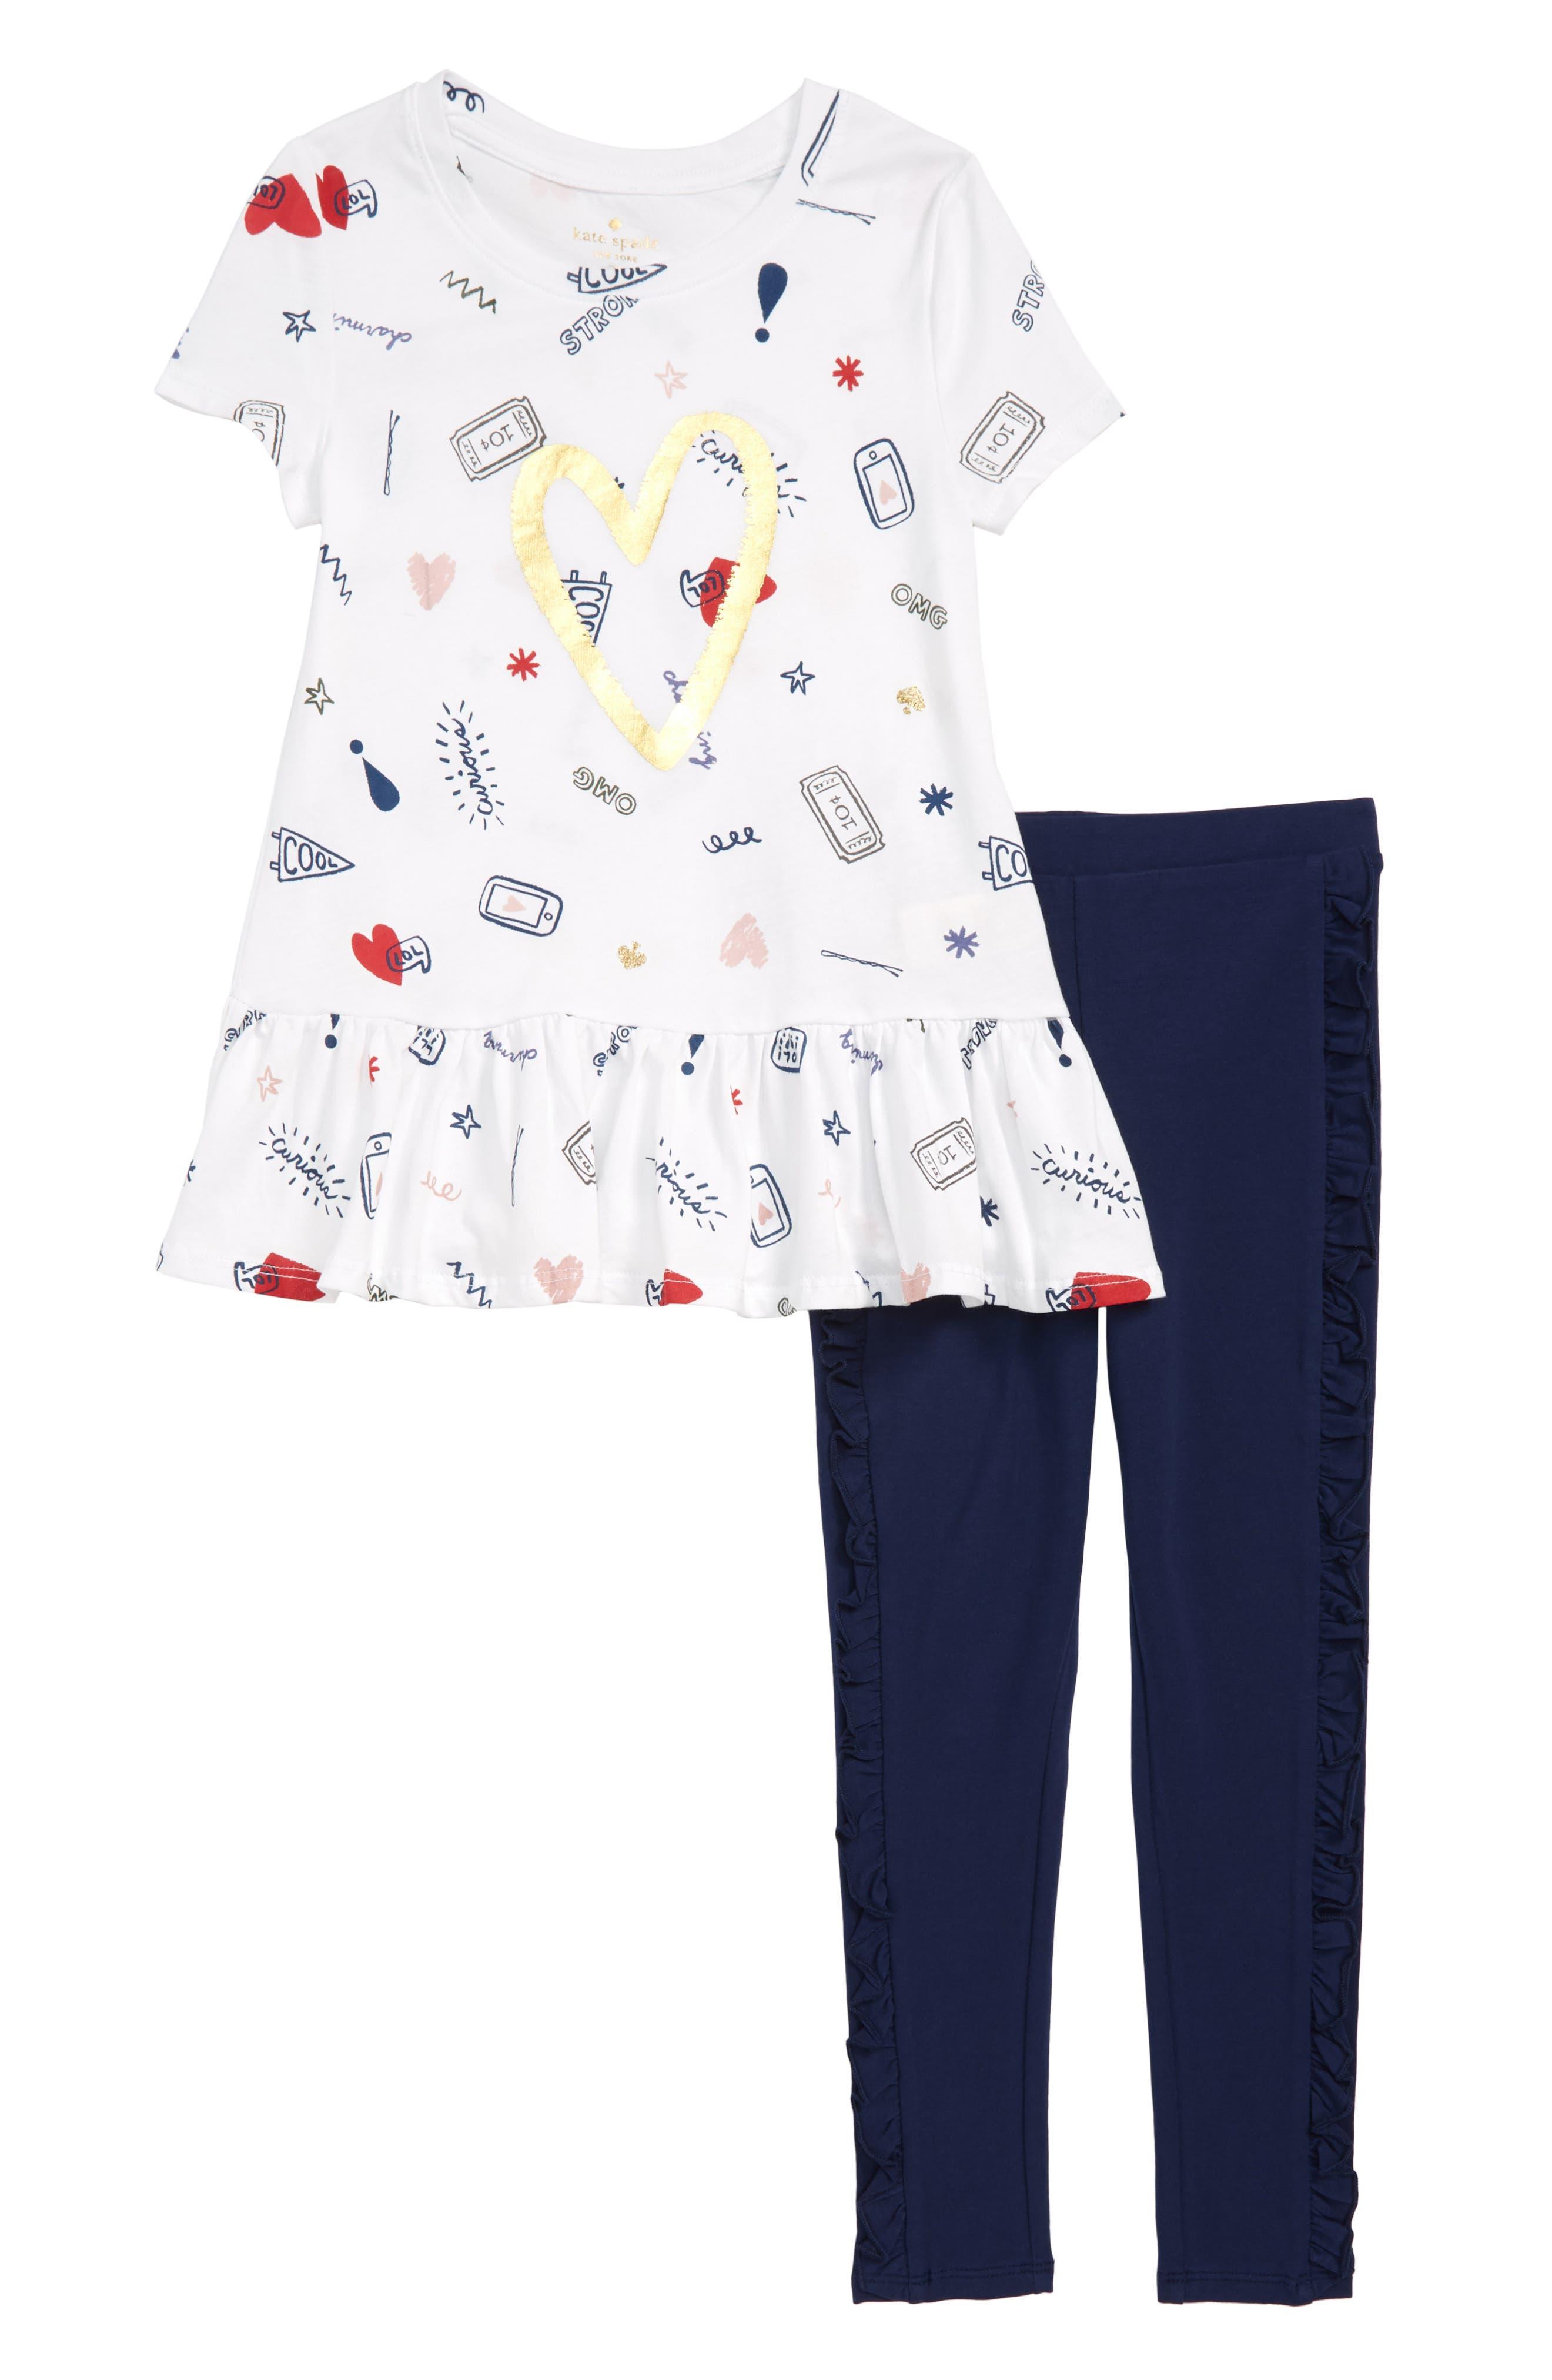 KATE SPADE NEW YORK,                             doodle print tunic & leggings set,                             Main thumbnail 1, color,                             100